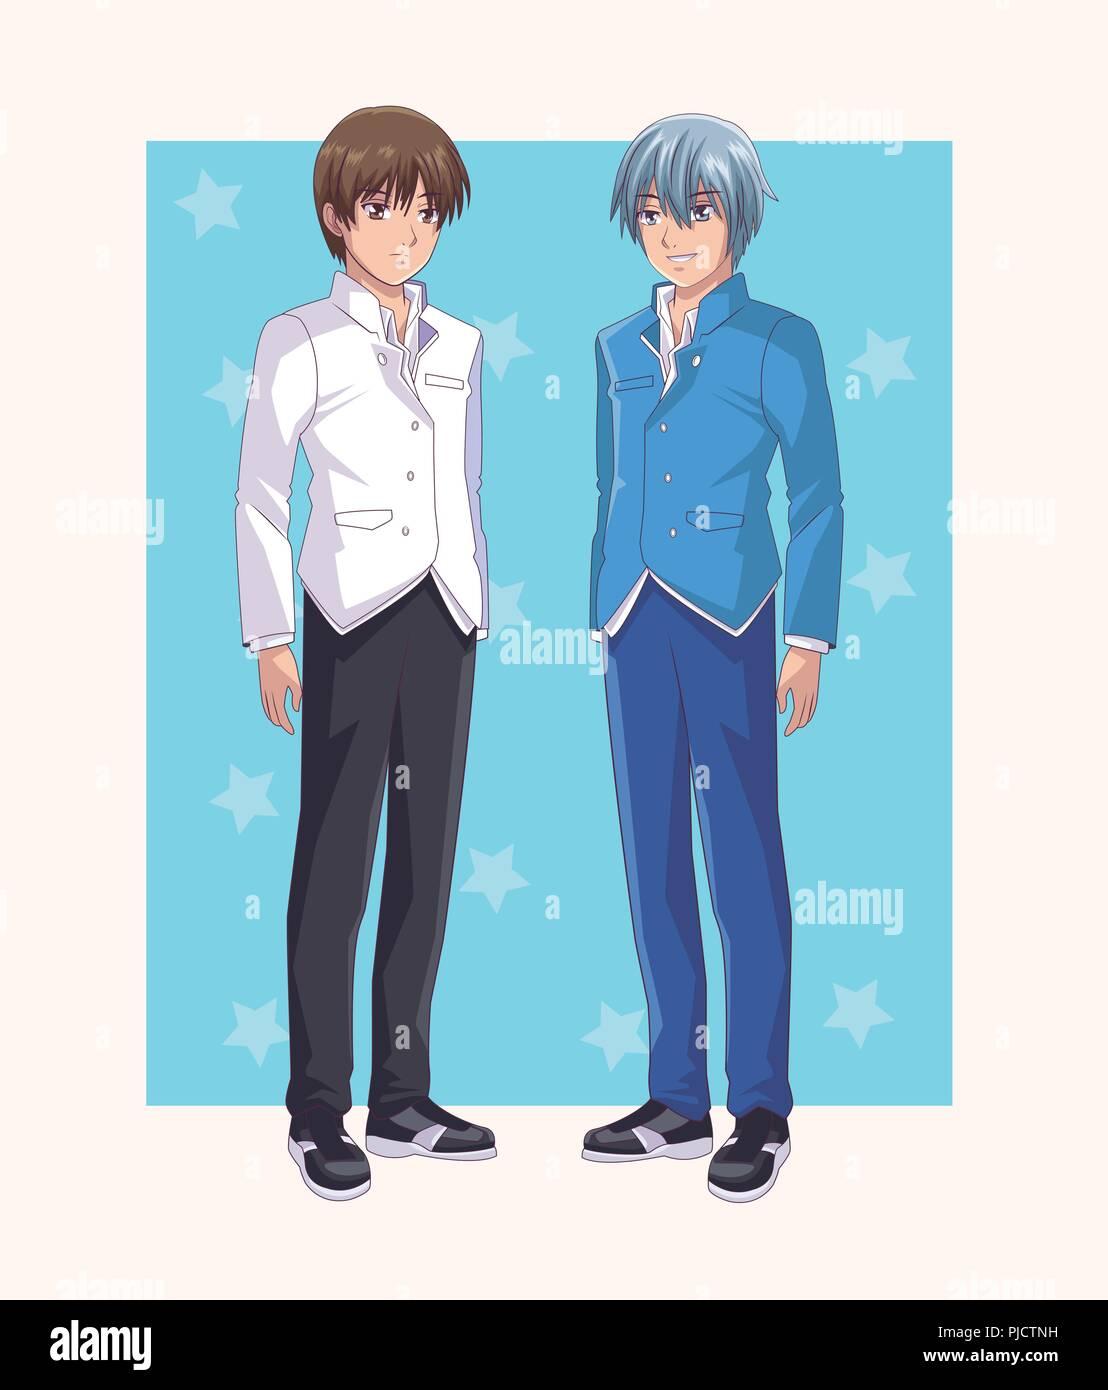 Abbildung Vektor Anime Mens Cartoons Junge Bild217871069 wiOkZuPXT